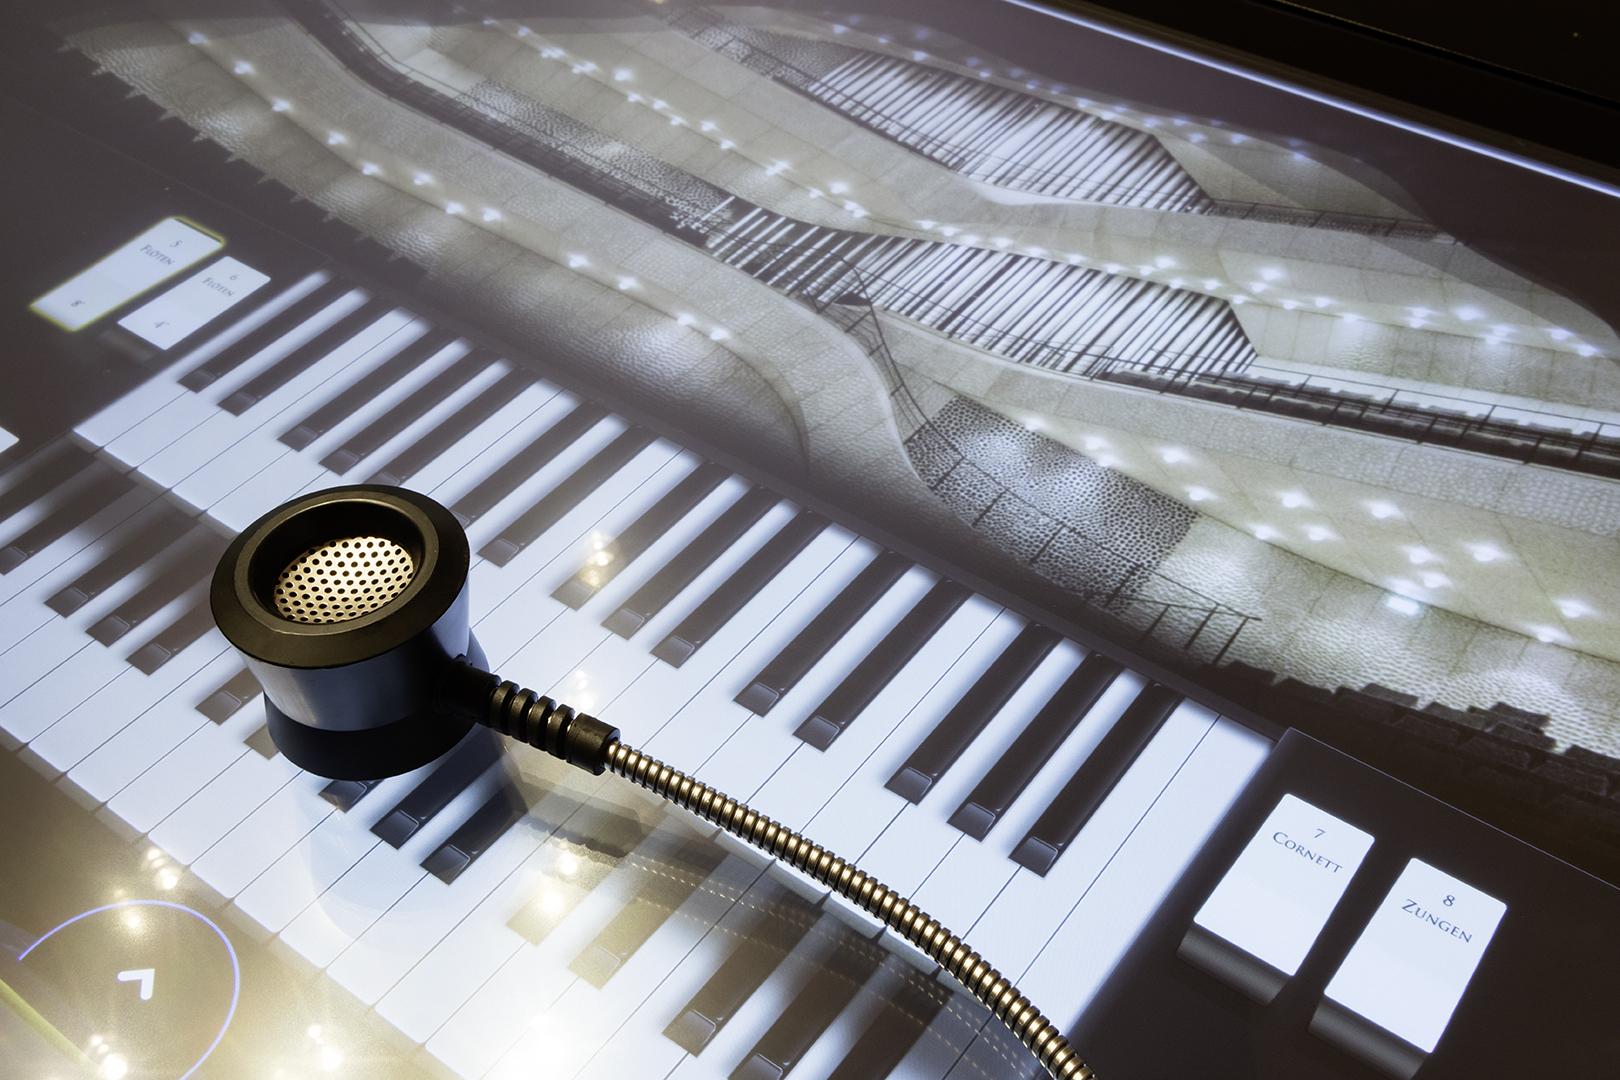 Interactive Organ